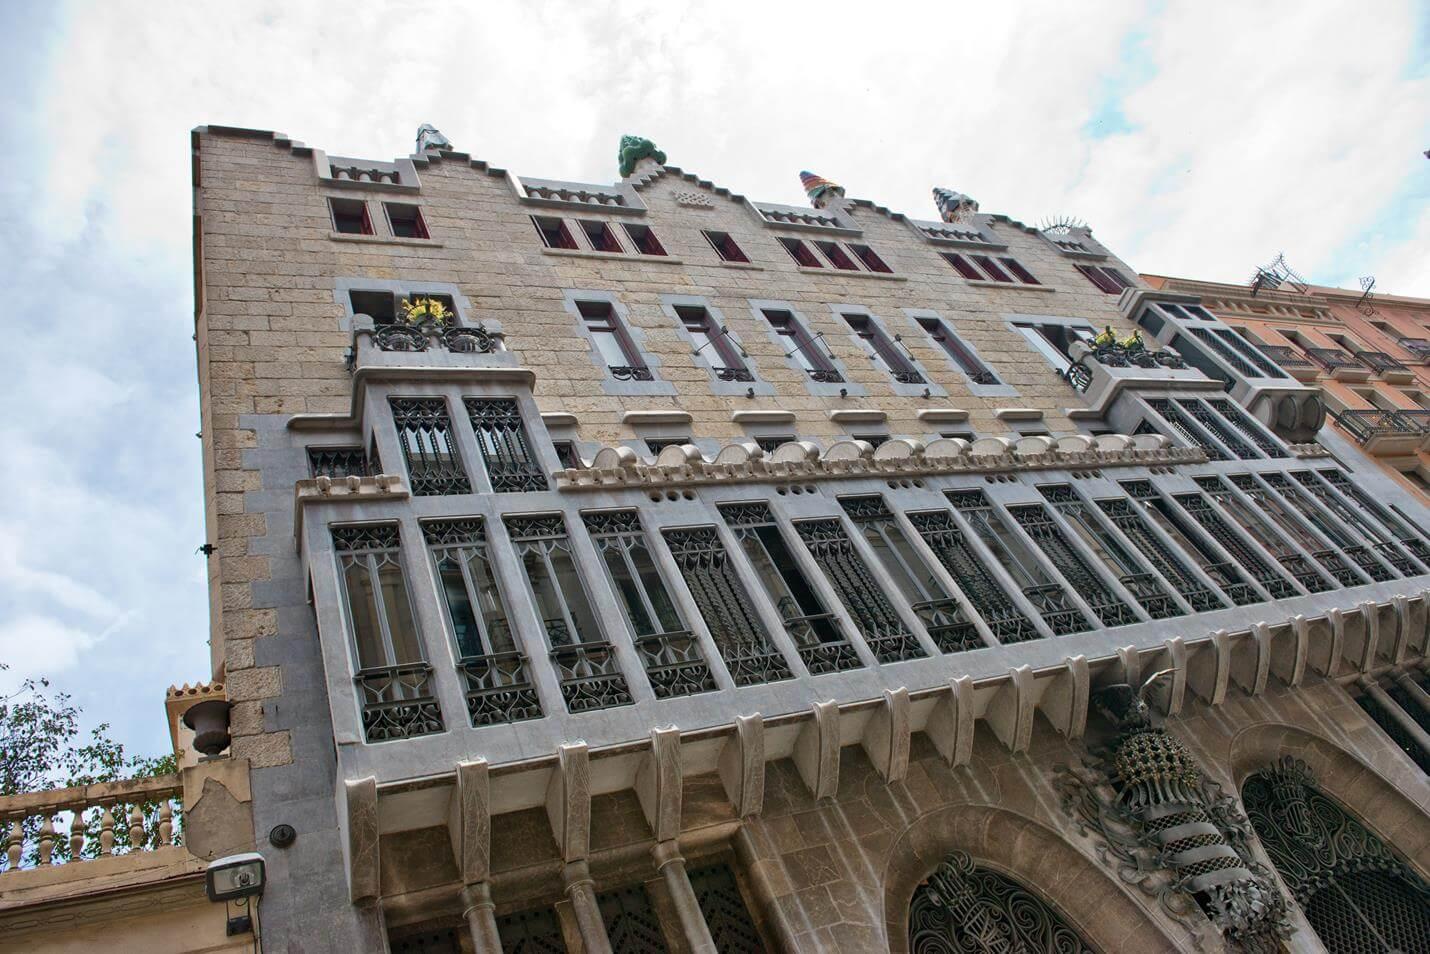 Palau Güell in Barcelona - Top